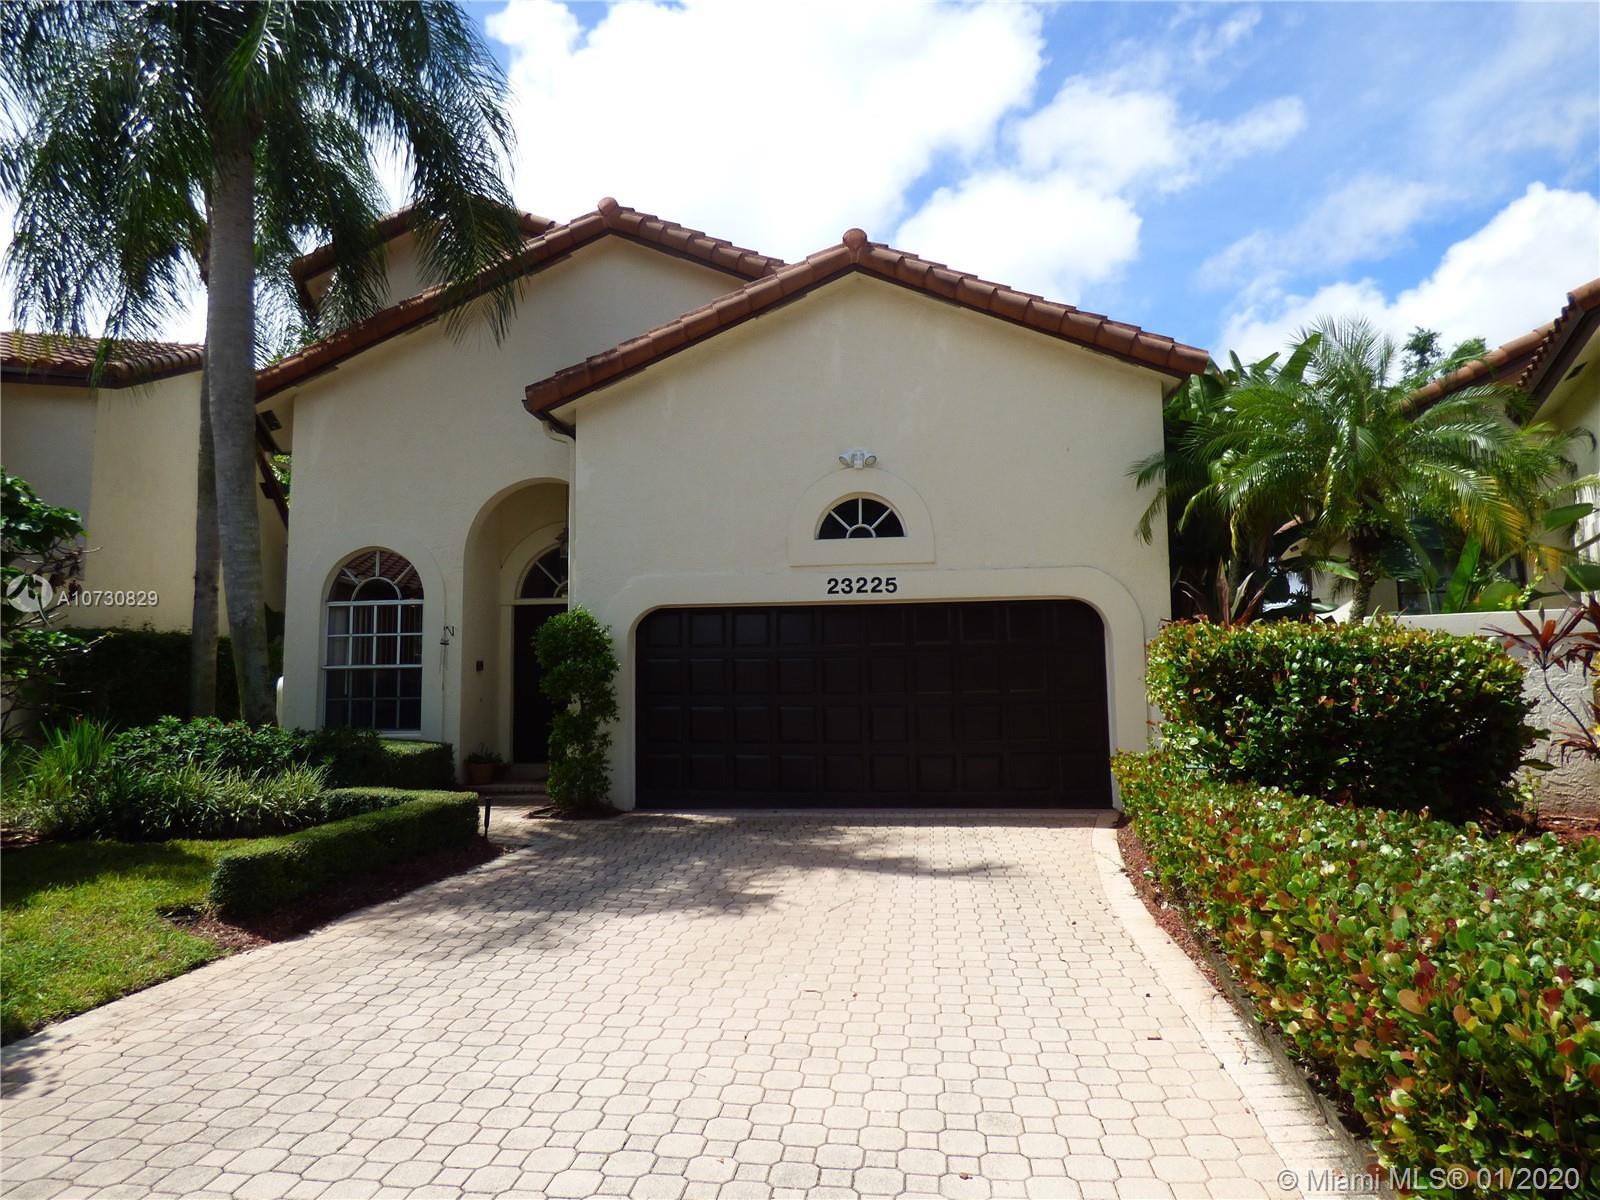 Property for sale at 23225 Via Stel, Boca Raton,  Florida 33433